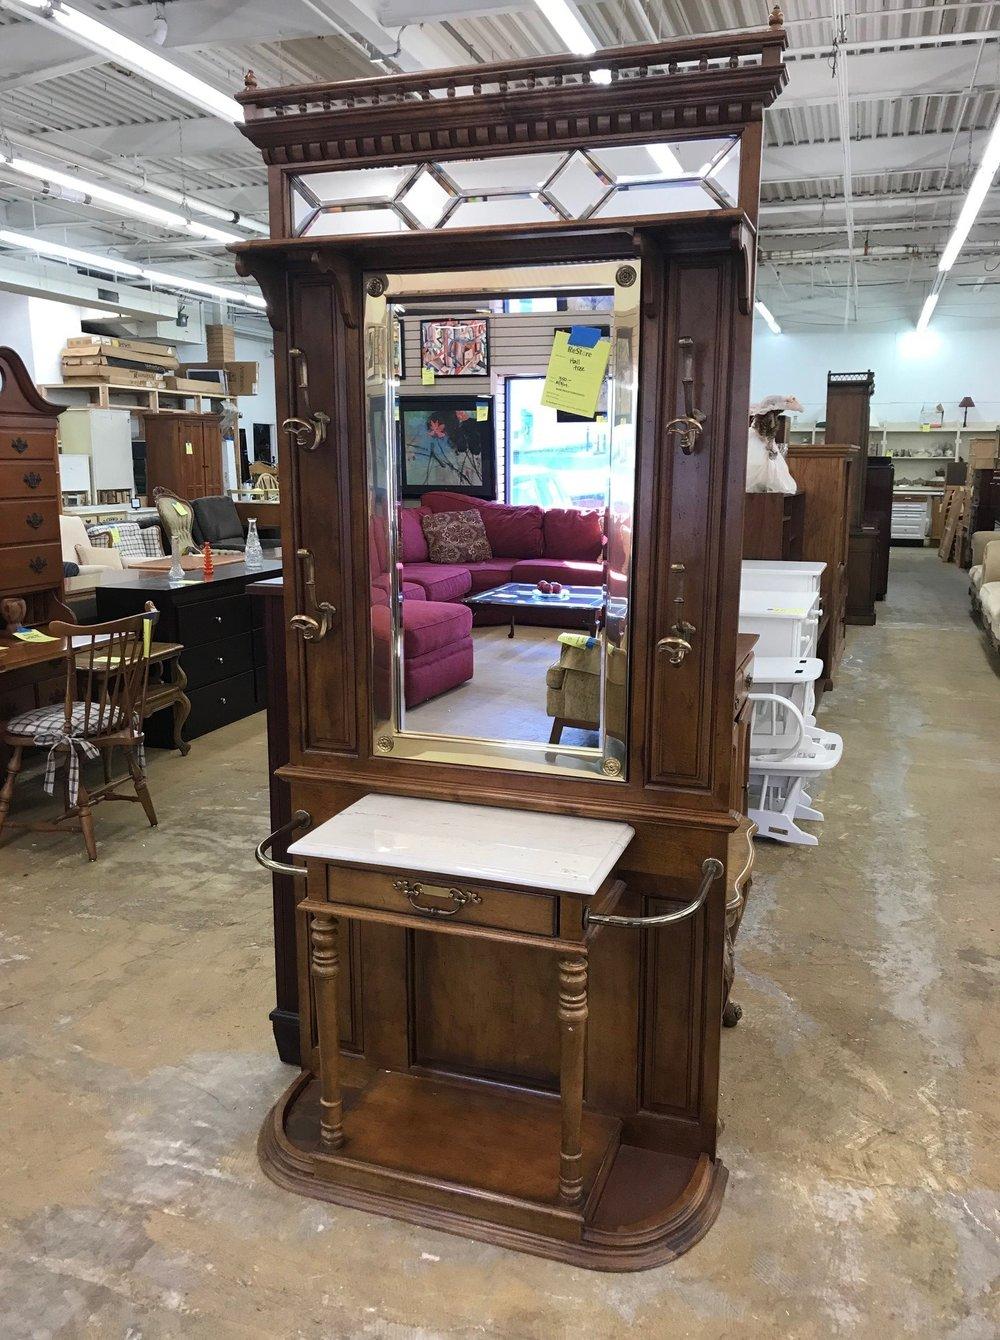 Habitat ReStore Bergen NJ - Furniture for Sale in NJ (9)-min.jpg